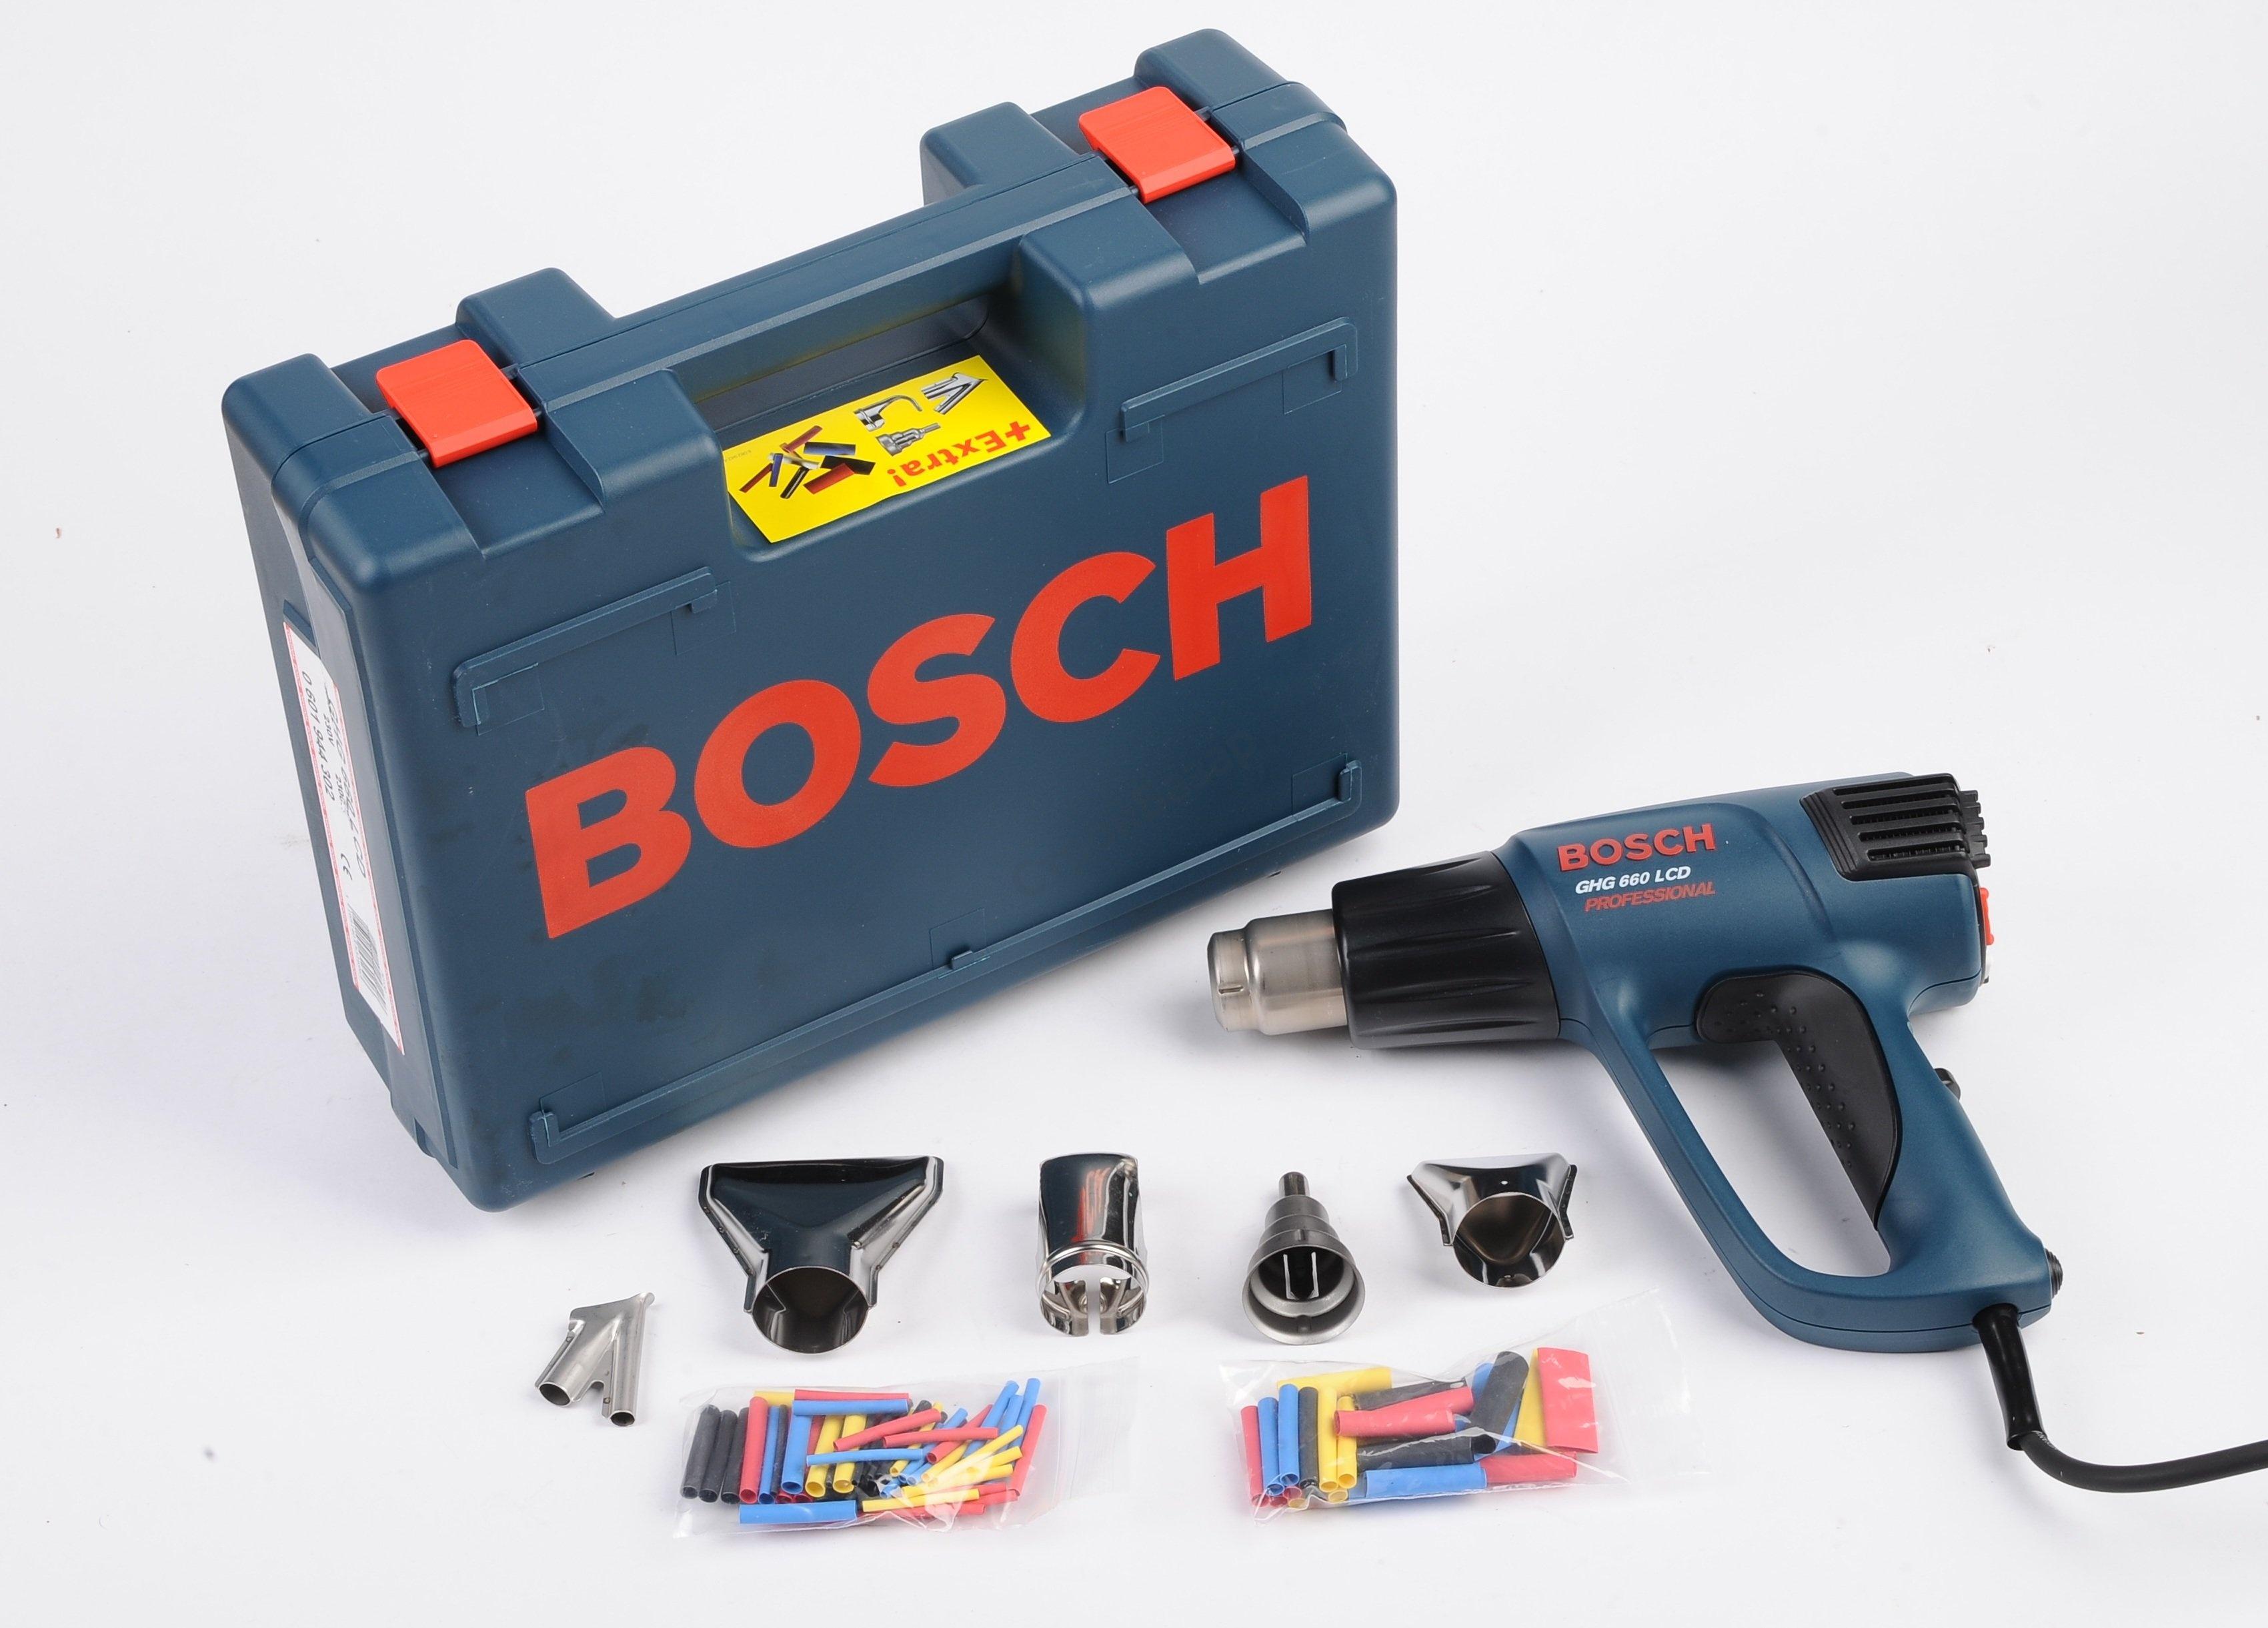 Бош GHG660LCD Профессионал